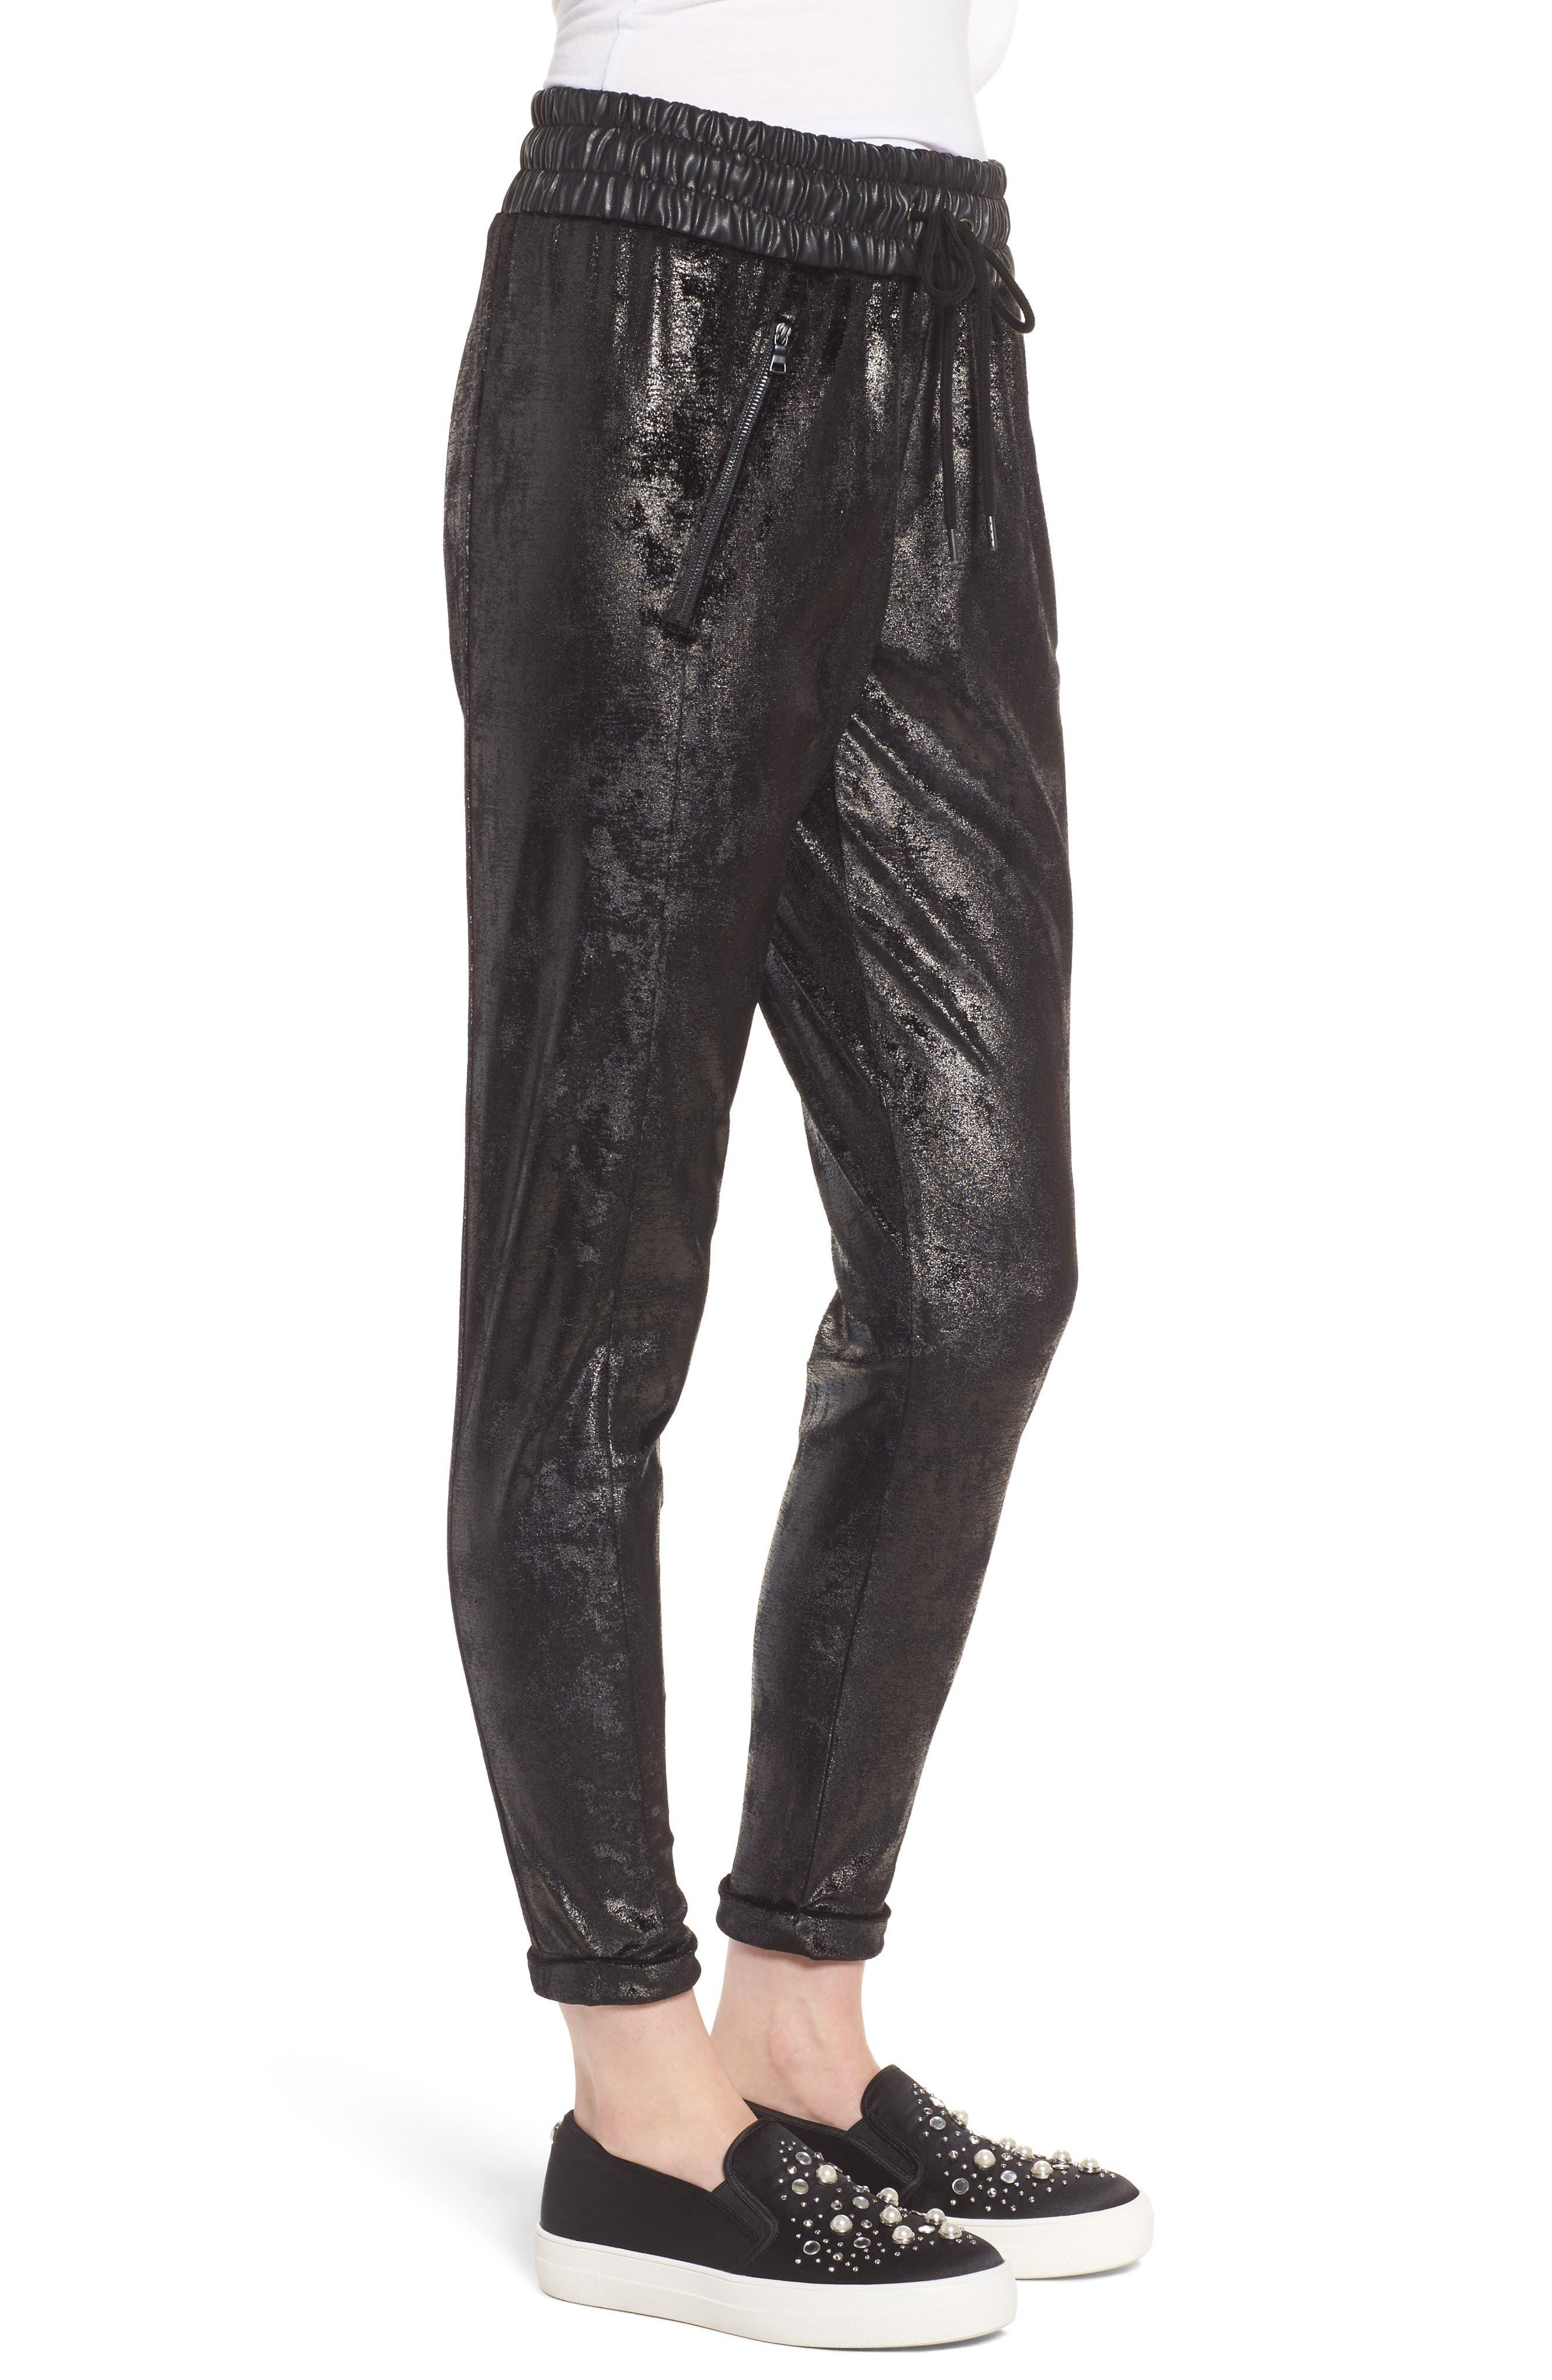 Randall Cuffed Sweatpants,                             Alternate thumbnail 3, color,                             Black